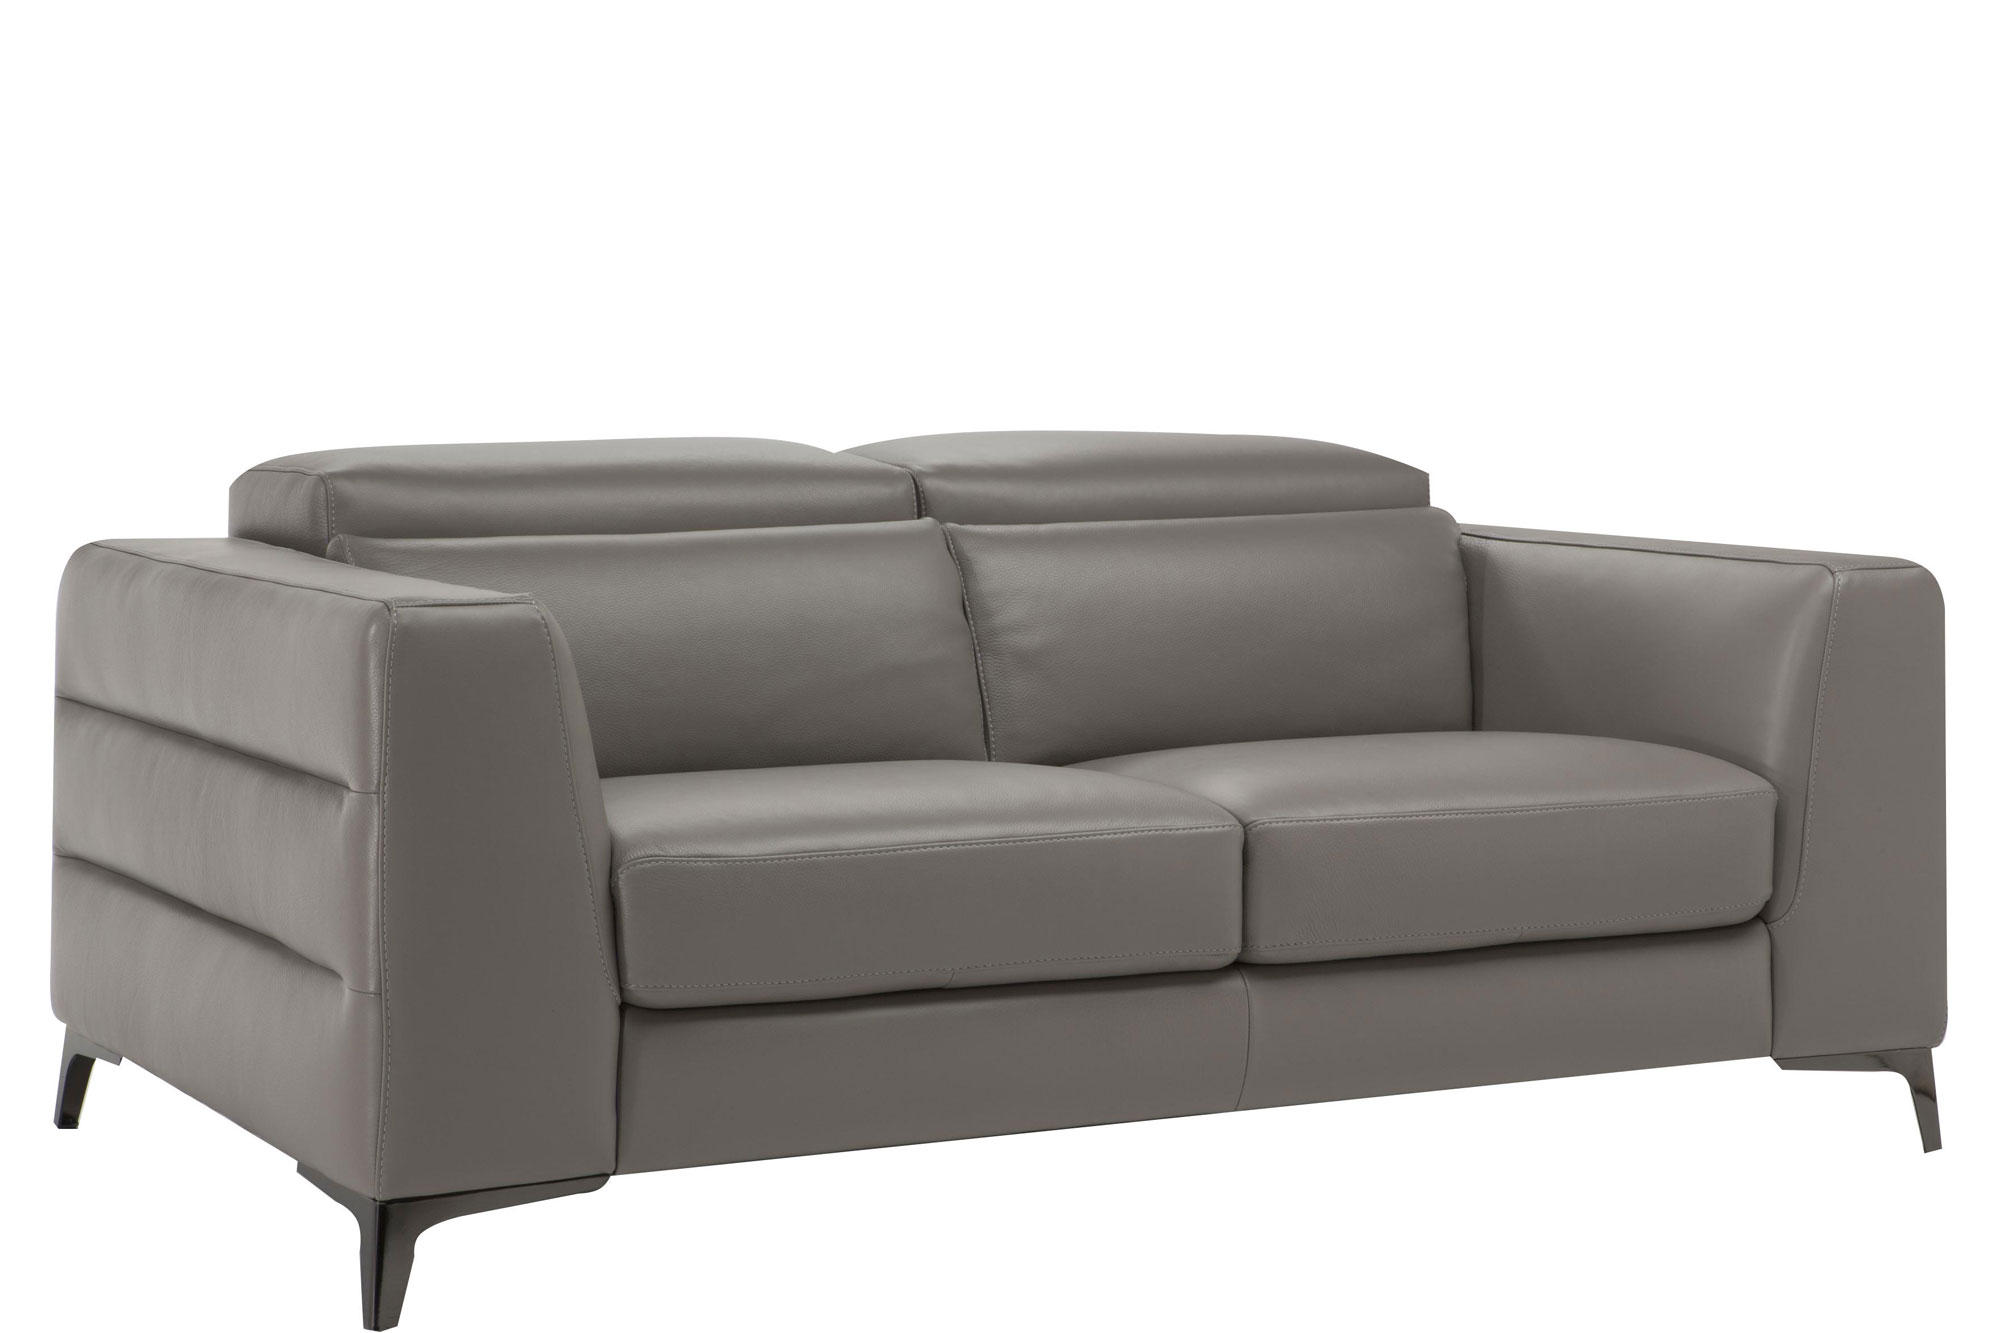 Picture of: Natuzzi Editions B979 Orgoglio Leather Sofa 10bk Arnotts